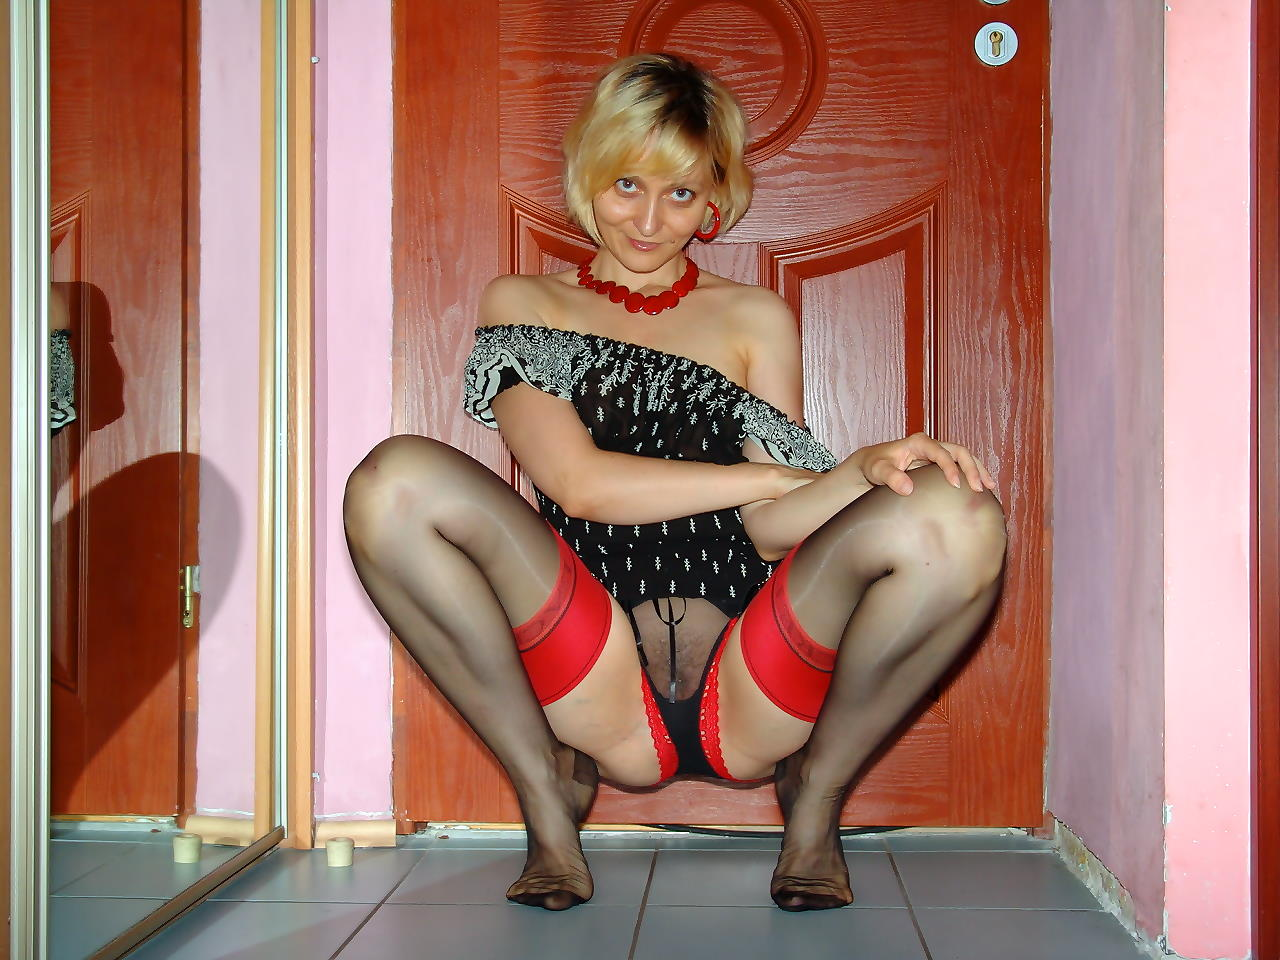 Фото эрот женщин 35